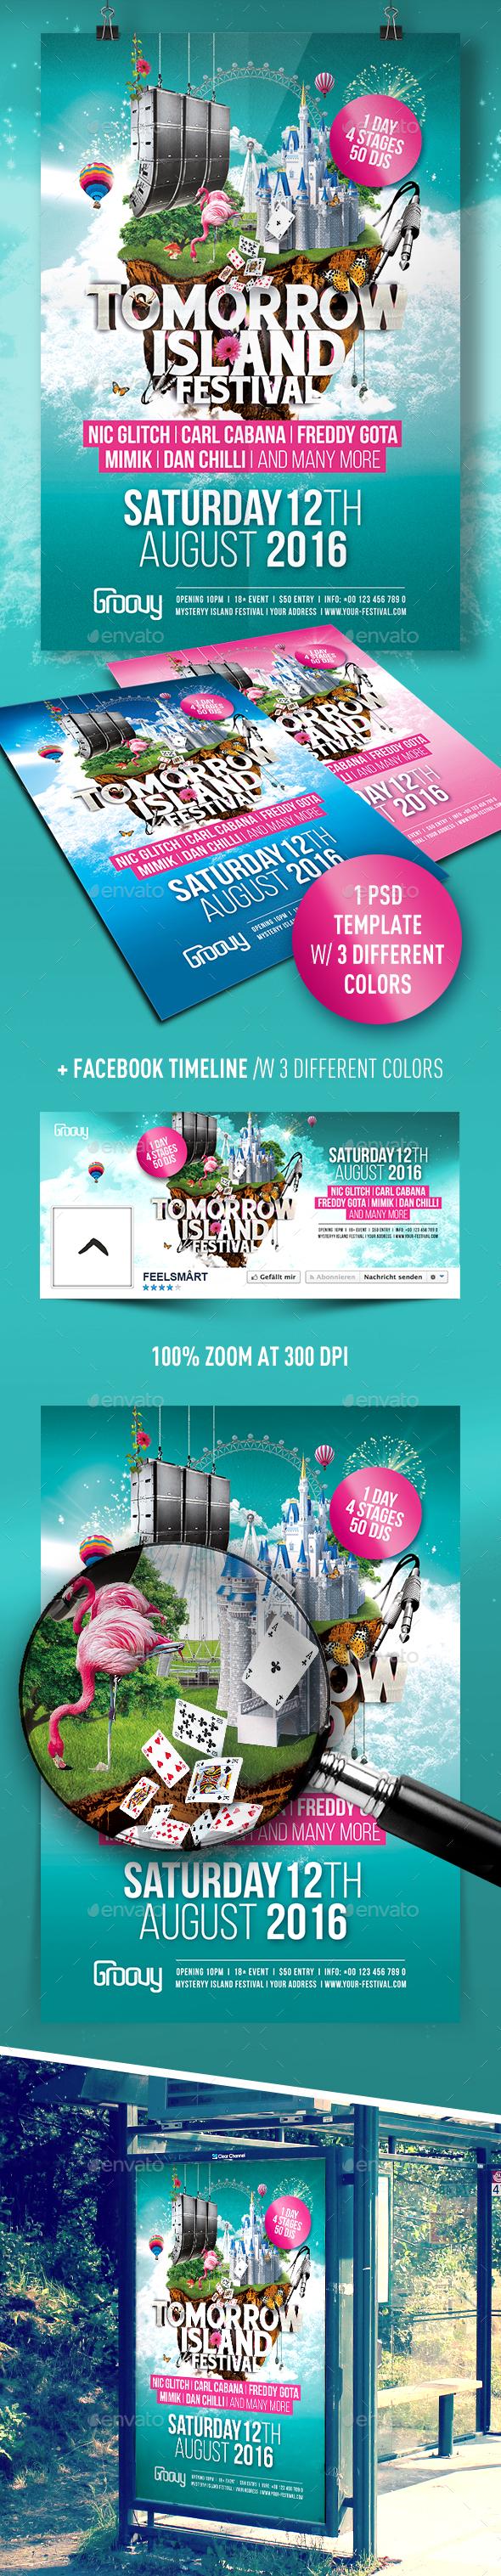 Tomorrow Island Festival Flyer - Events Flyers